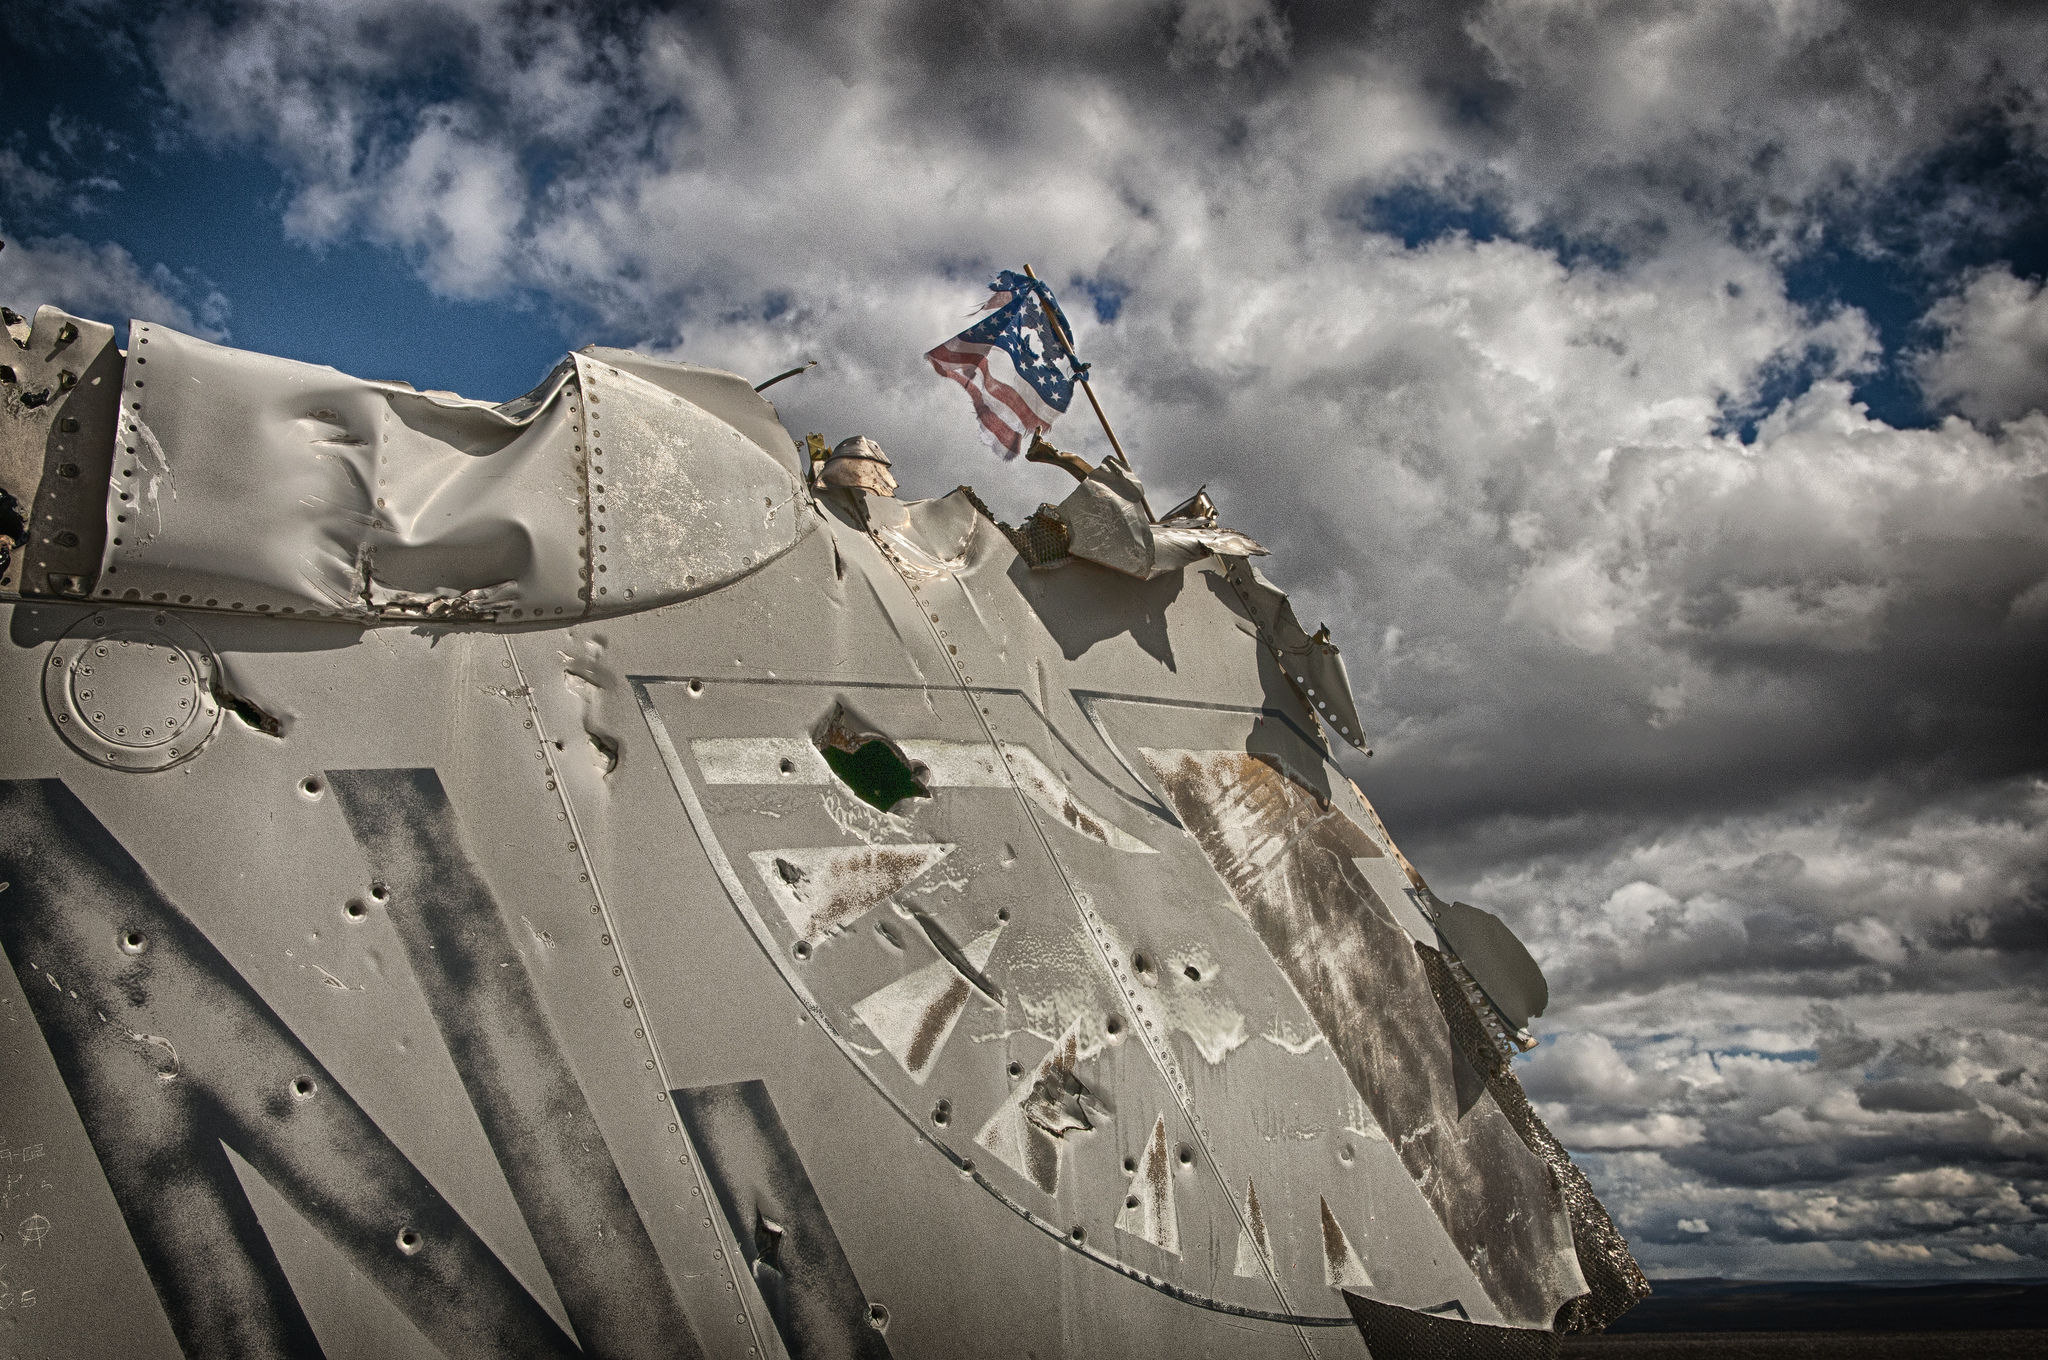 File:My Public Lands Roadtrip- Air Crash Museum in Oregon